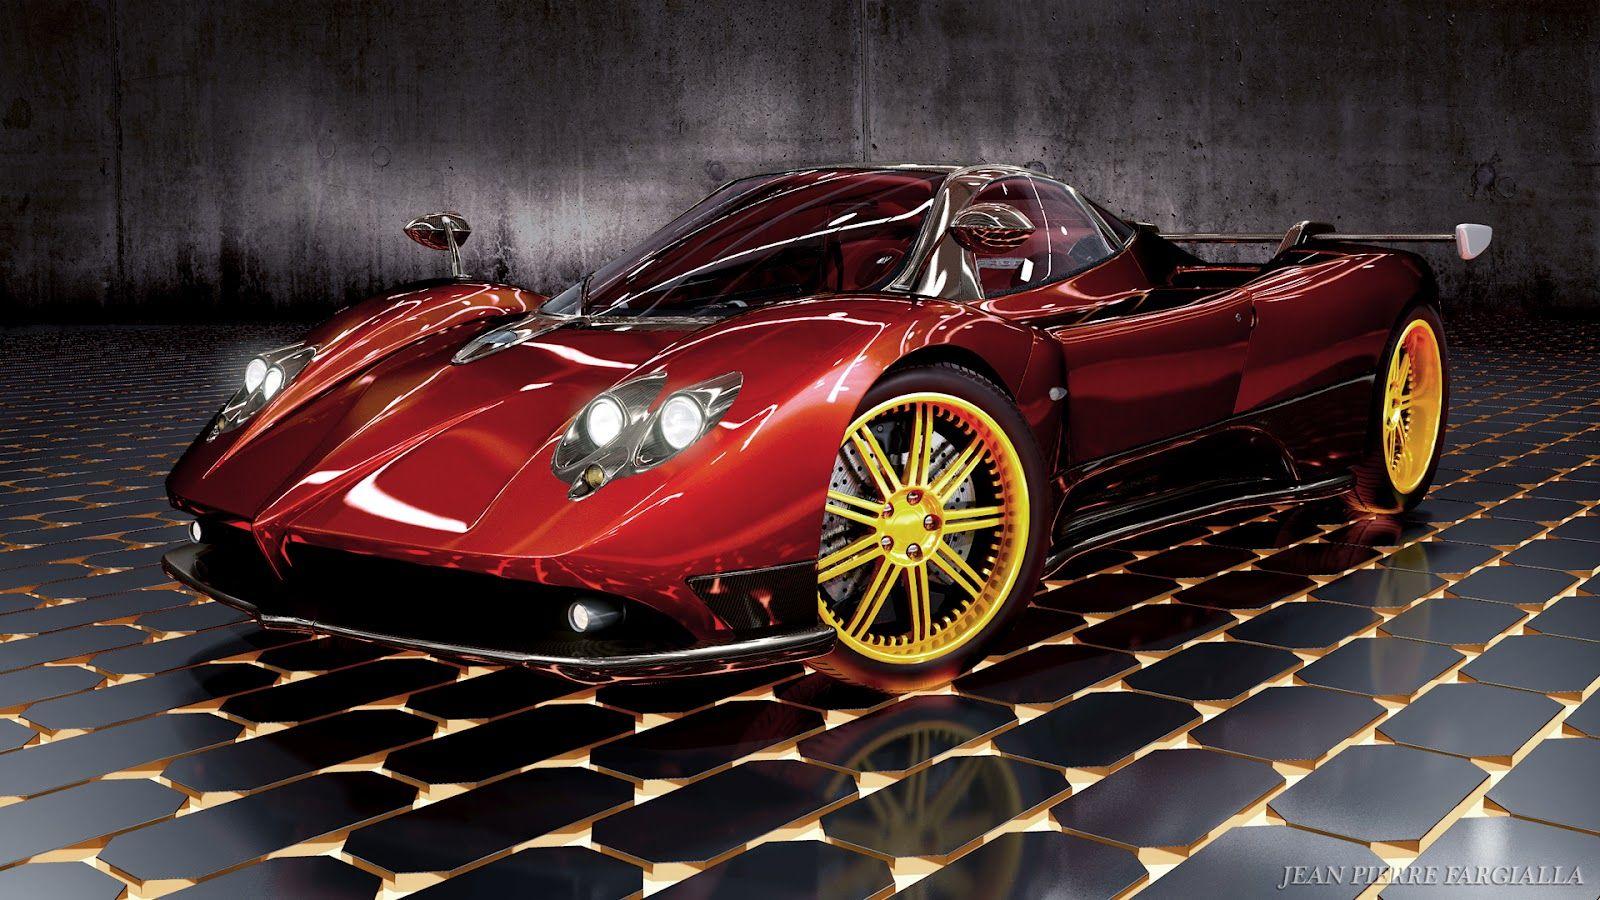 Pagani-Zonda-Car-3d-Images.jpg